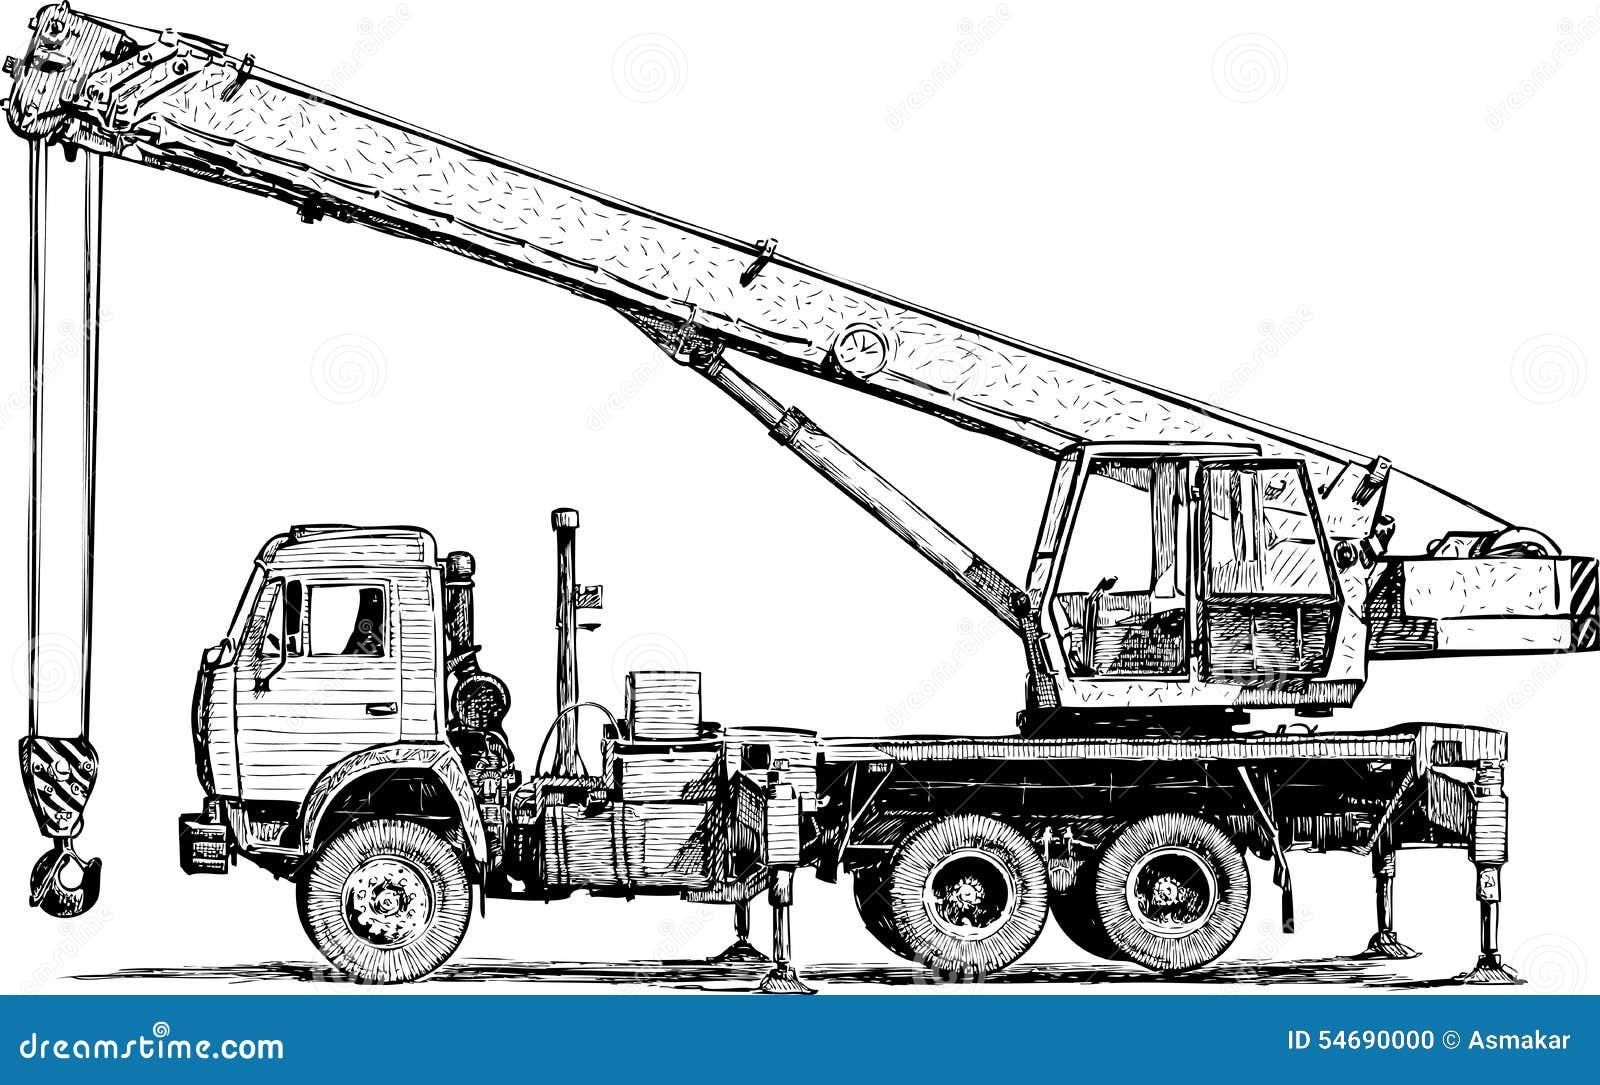 Mobile Crane Stock Vector Illustration Of Transportation